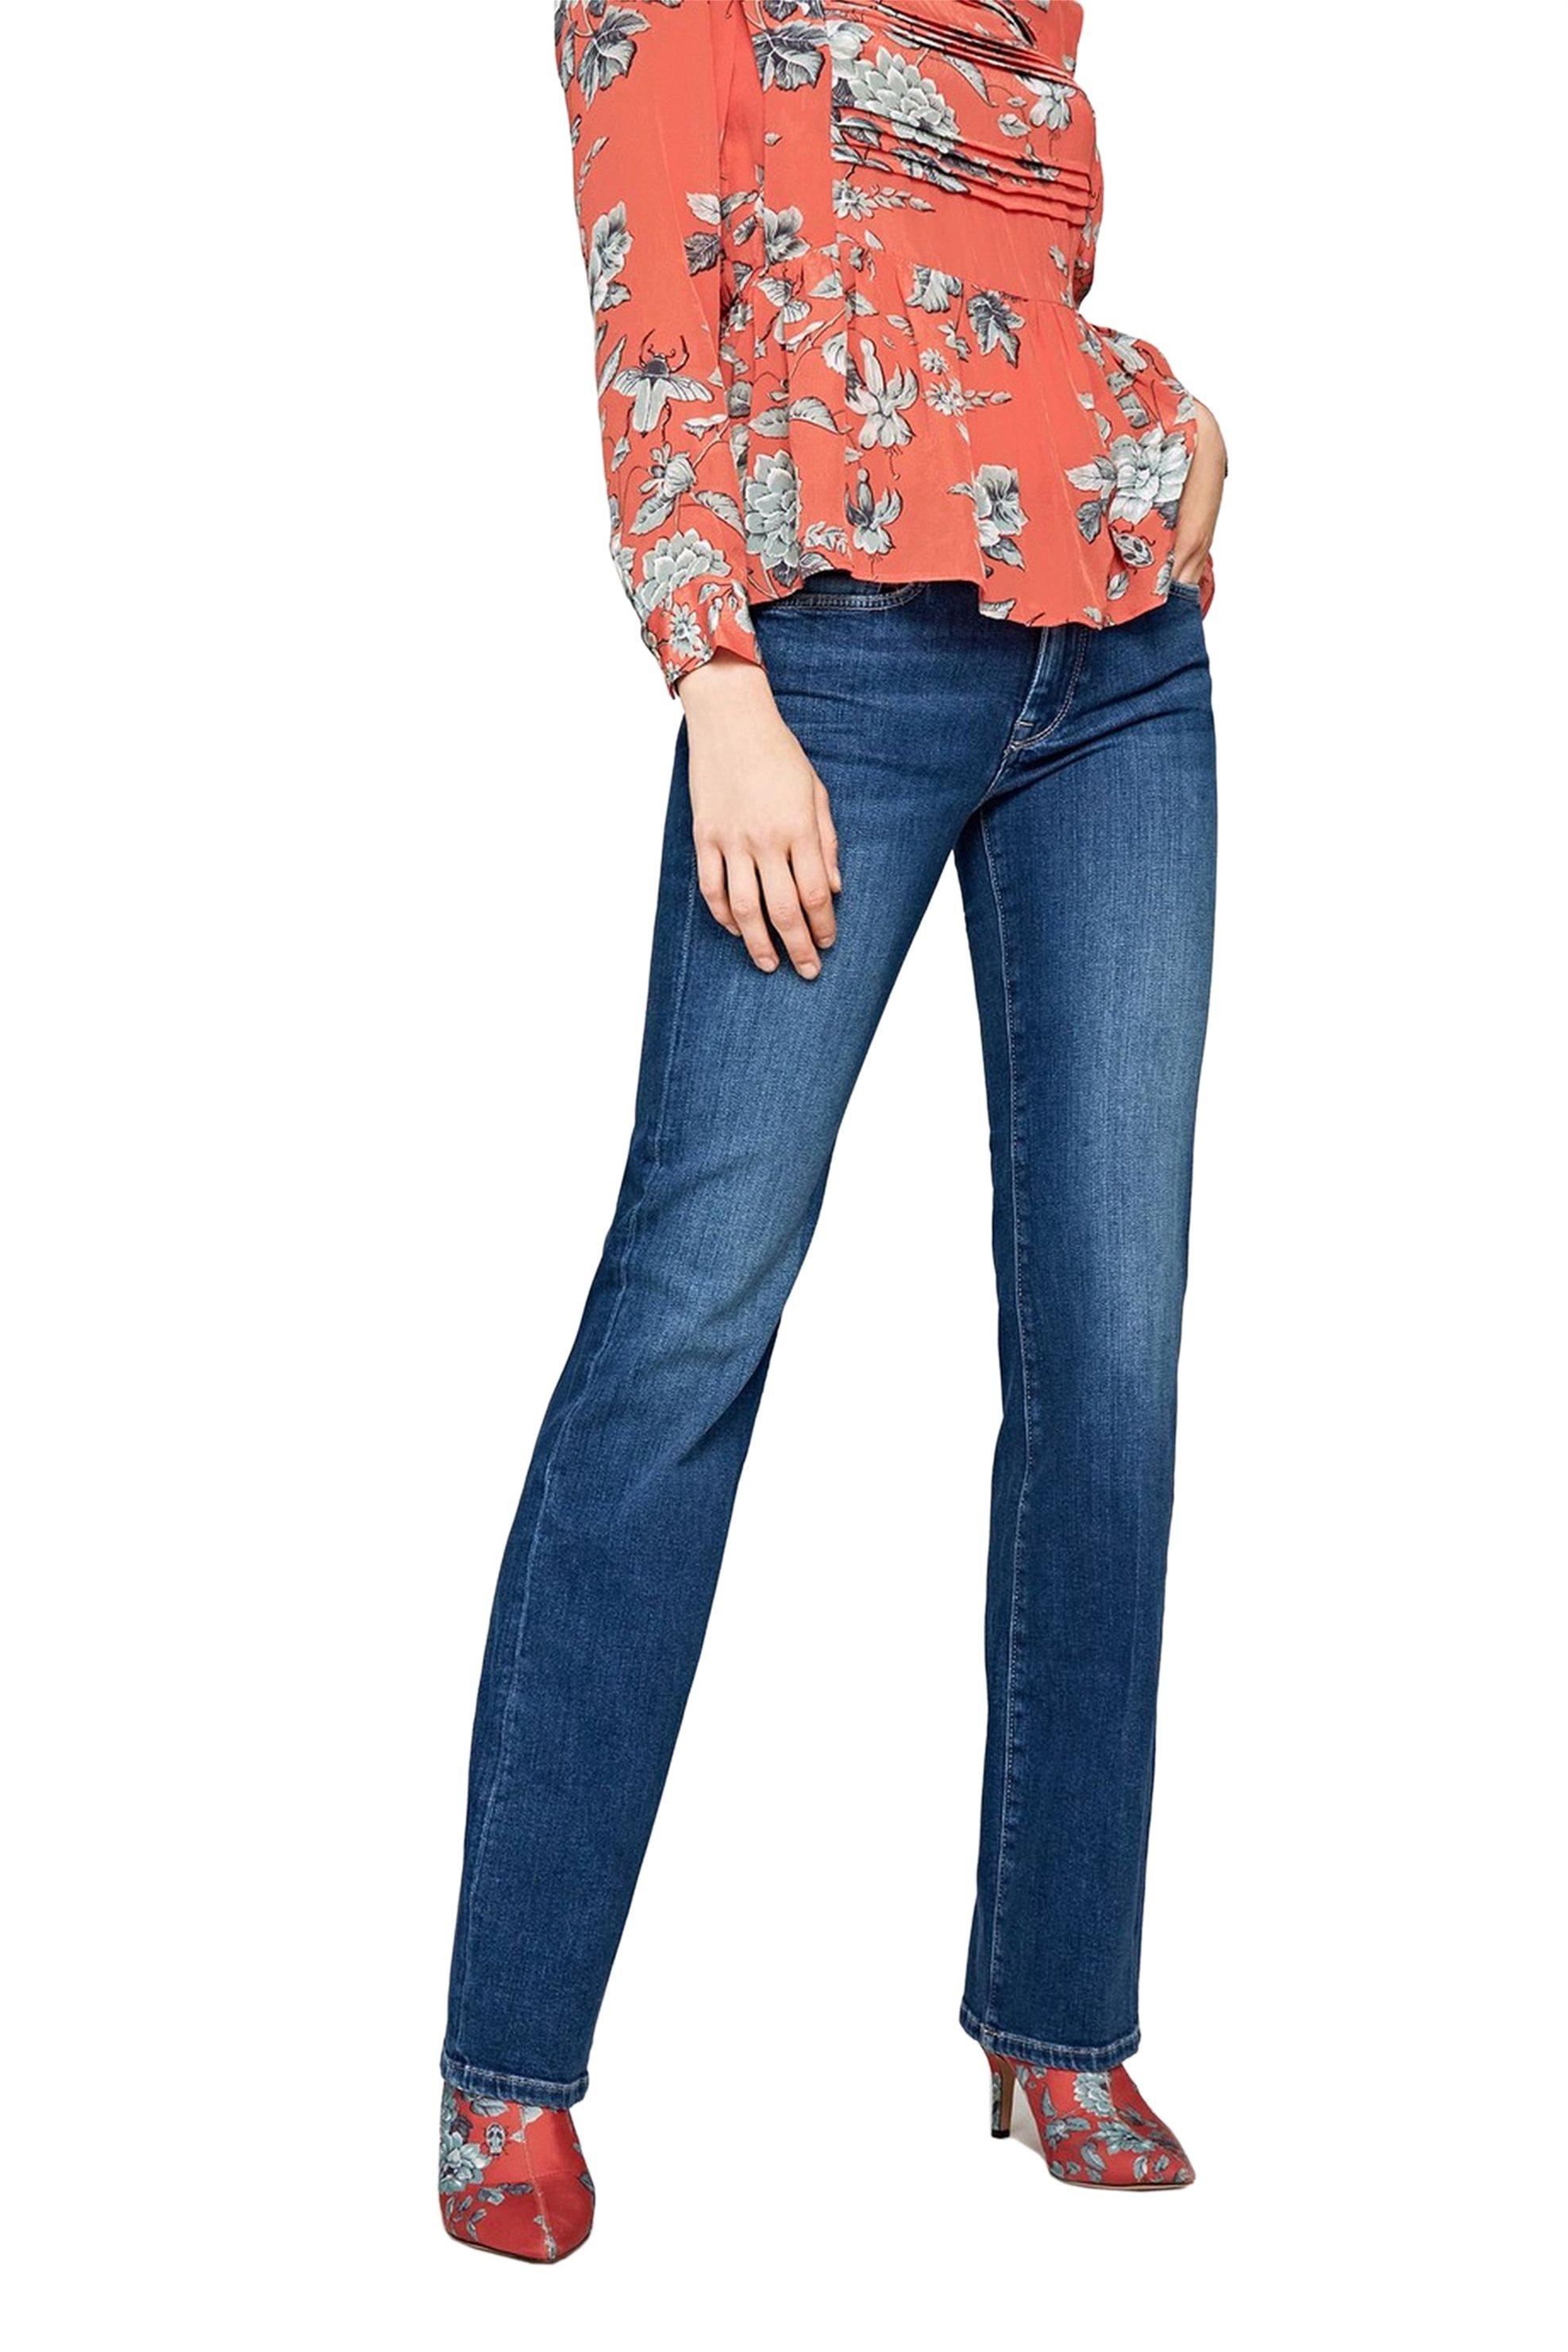 93c71a4c5483 Notos Pepe Jeans γυναικείο τζην παντελόνι flare Αubrey L32 - PL202229GN32 -  Μπλε